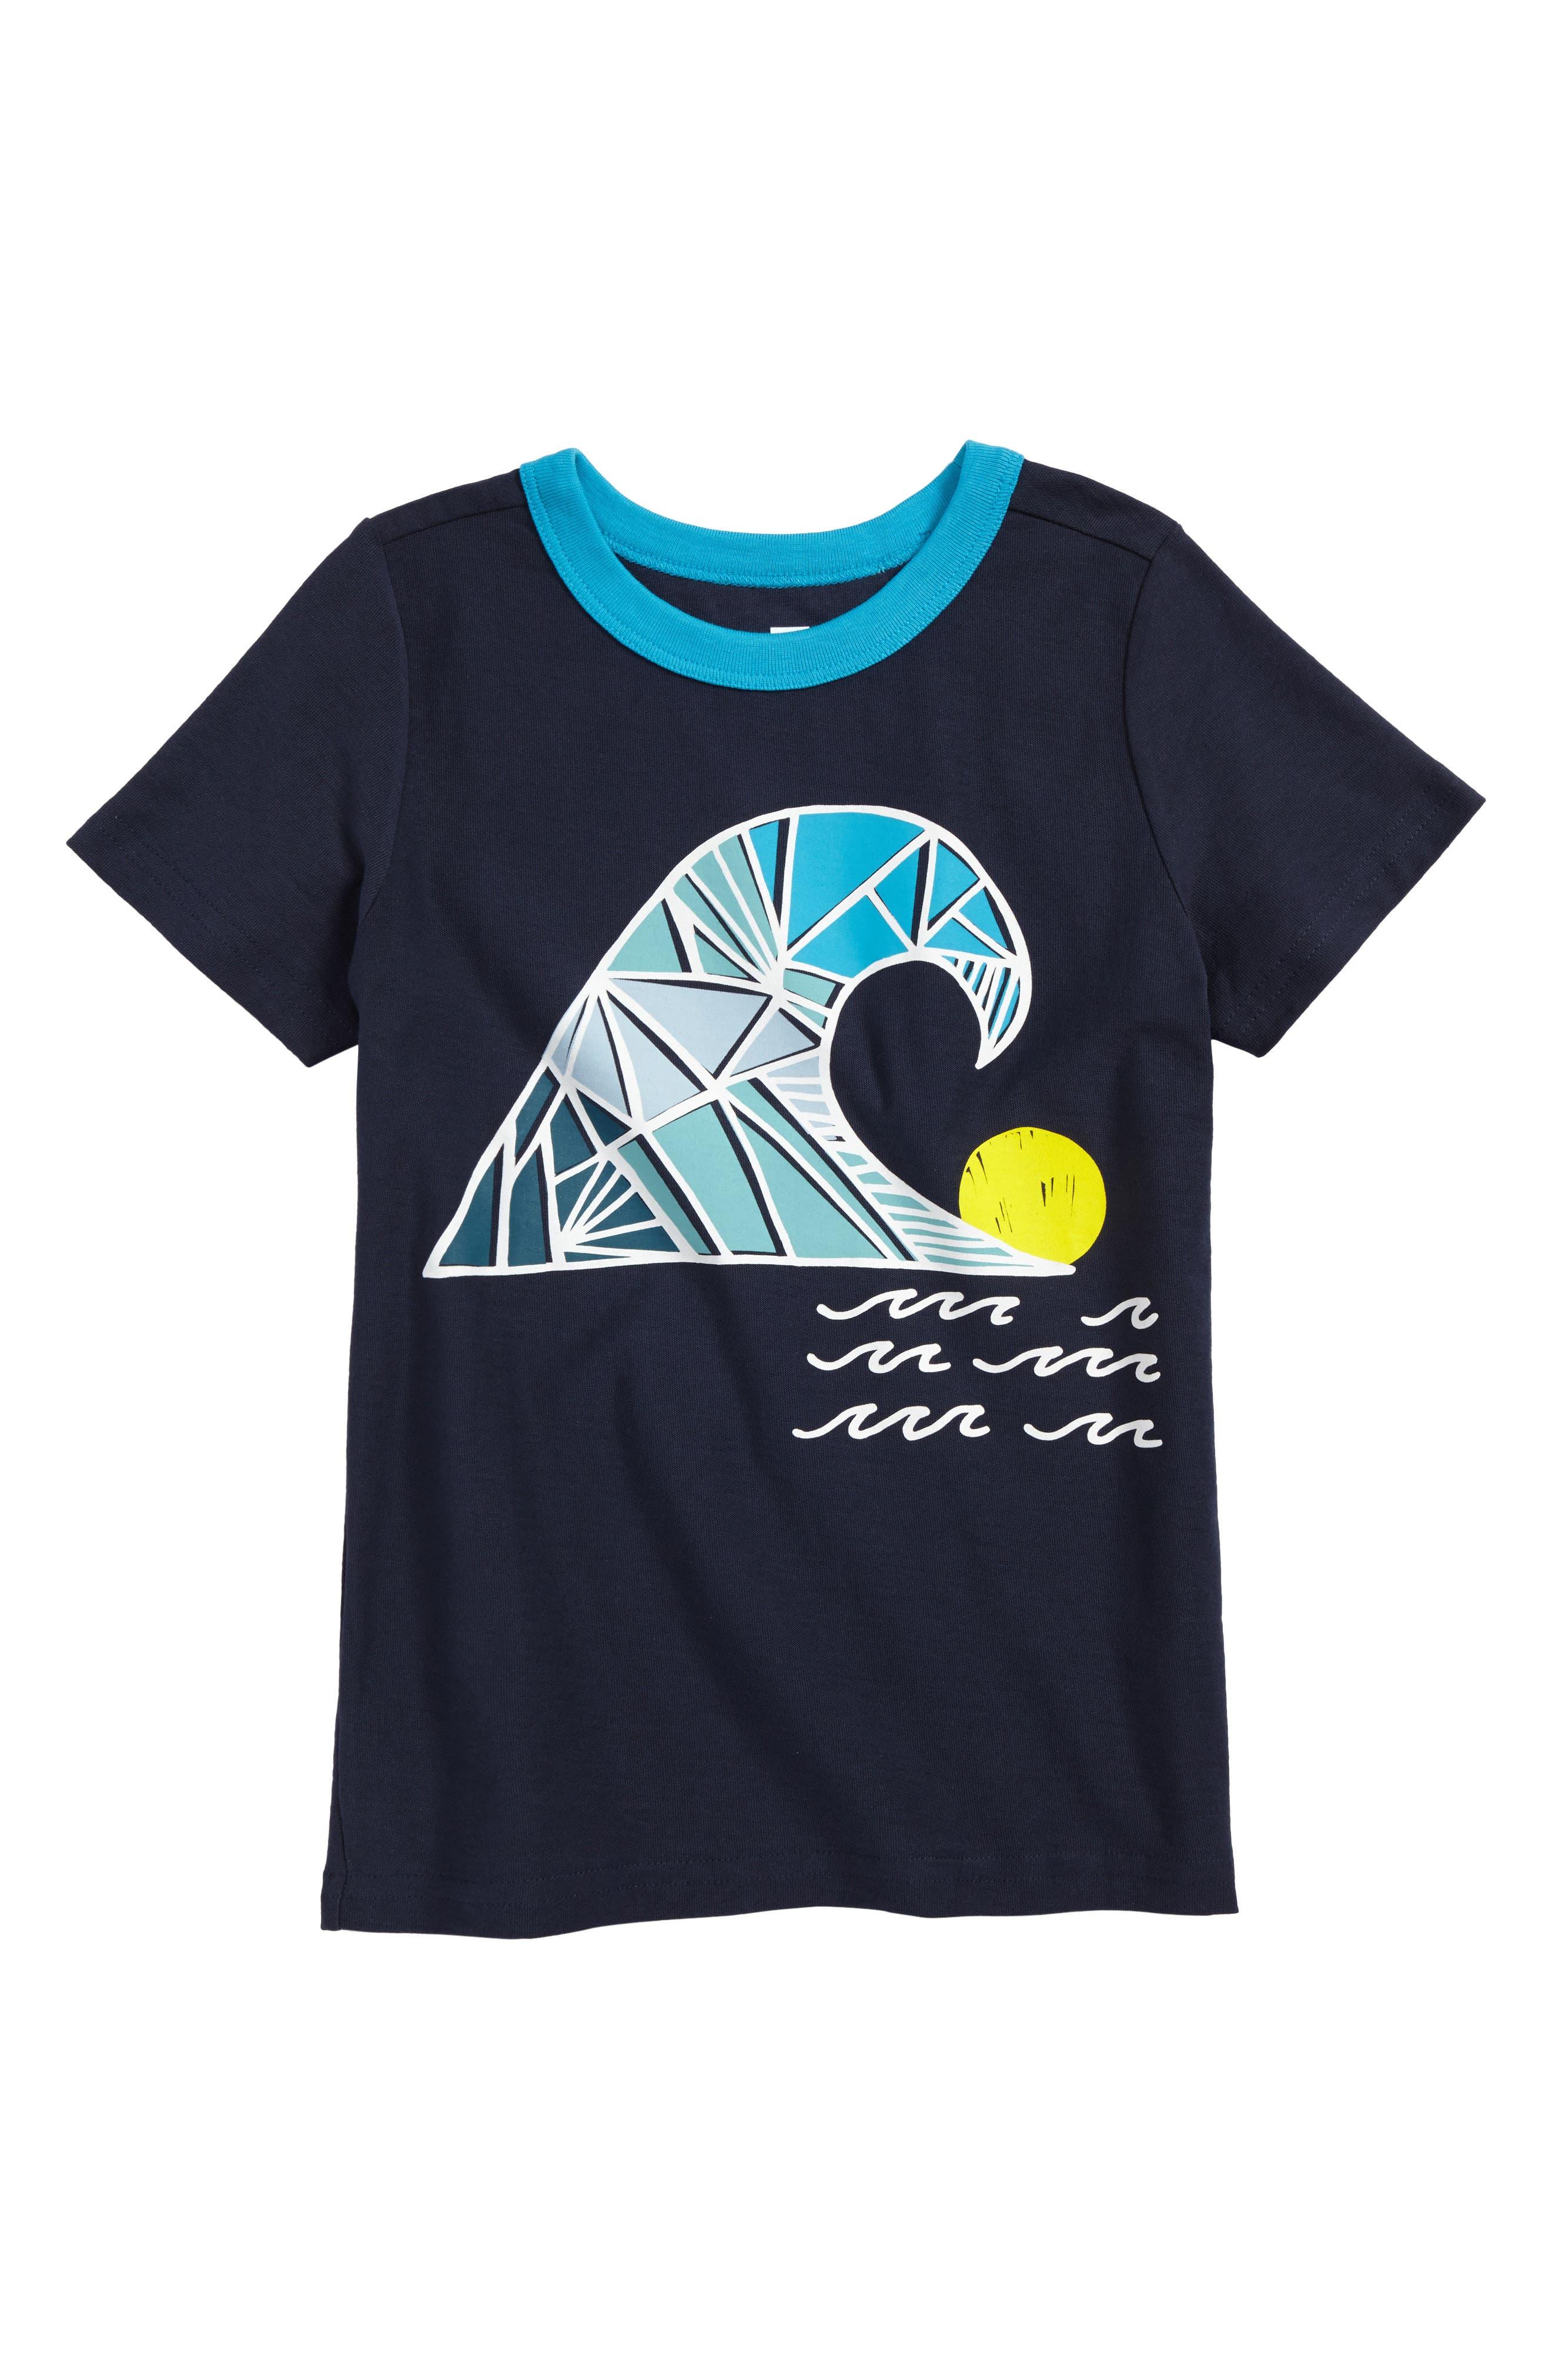 Swell Day T-Shirt,                         Main,                         color, Indigo